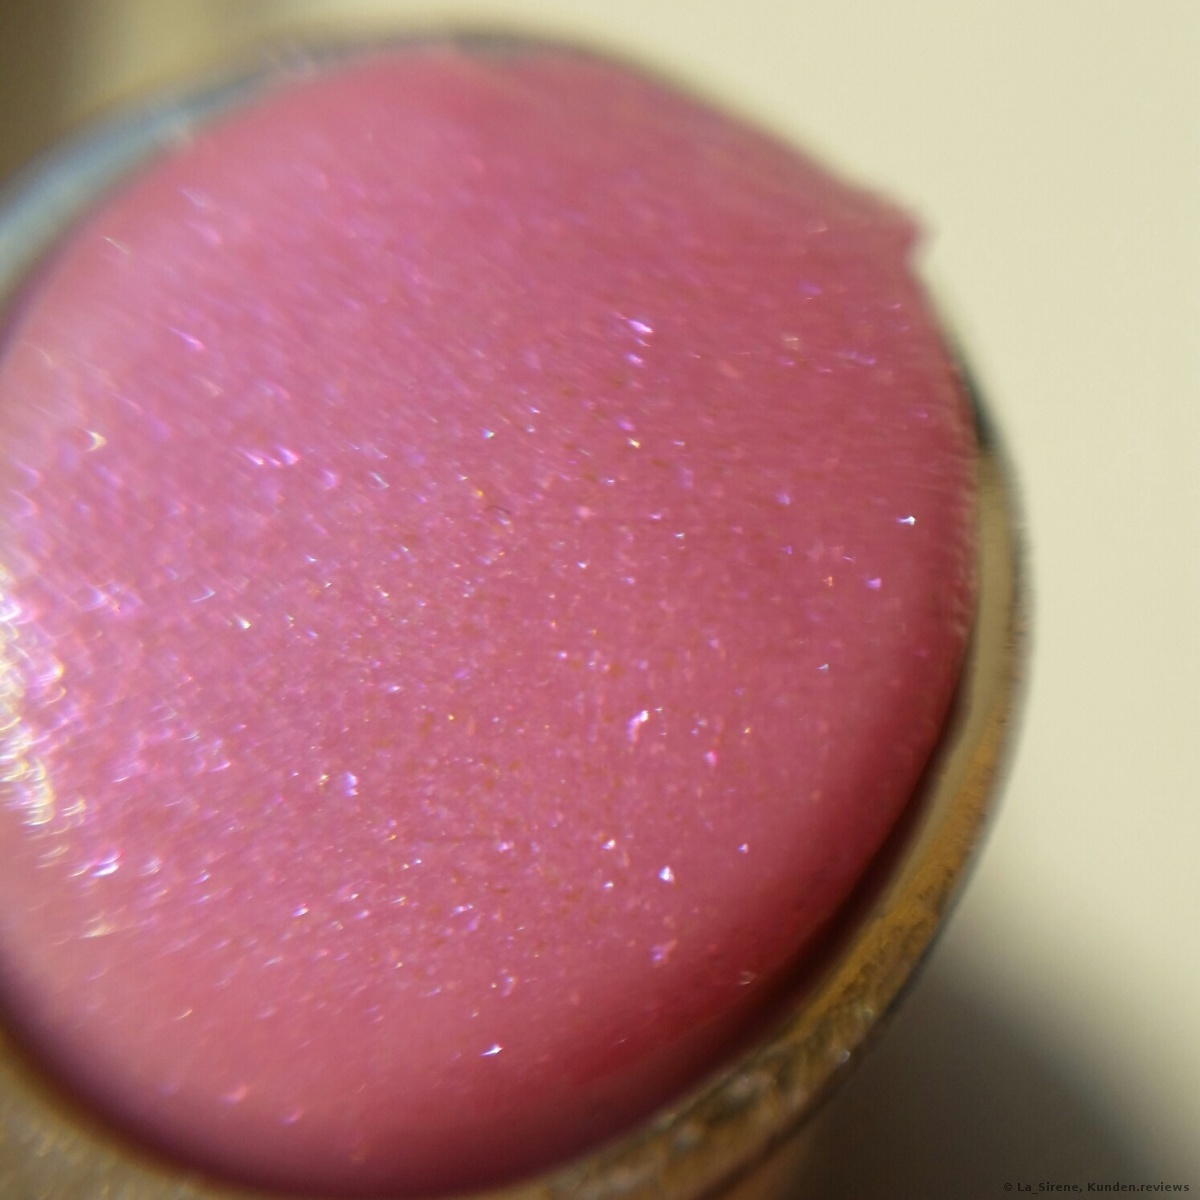 Dior Addict Lip Glow Spring-Summer 2018 Lippenbalm Foto